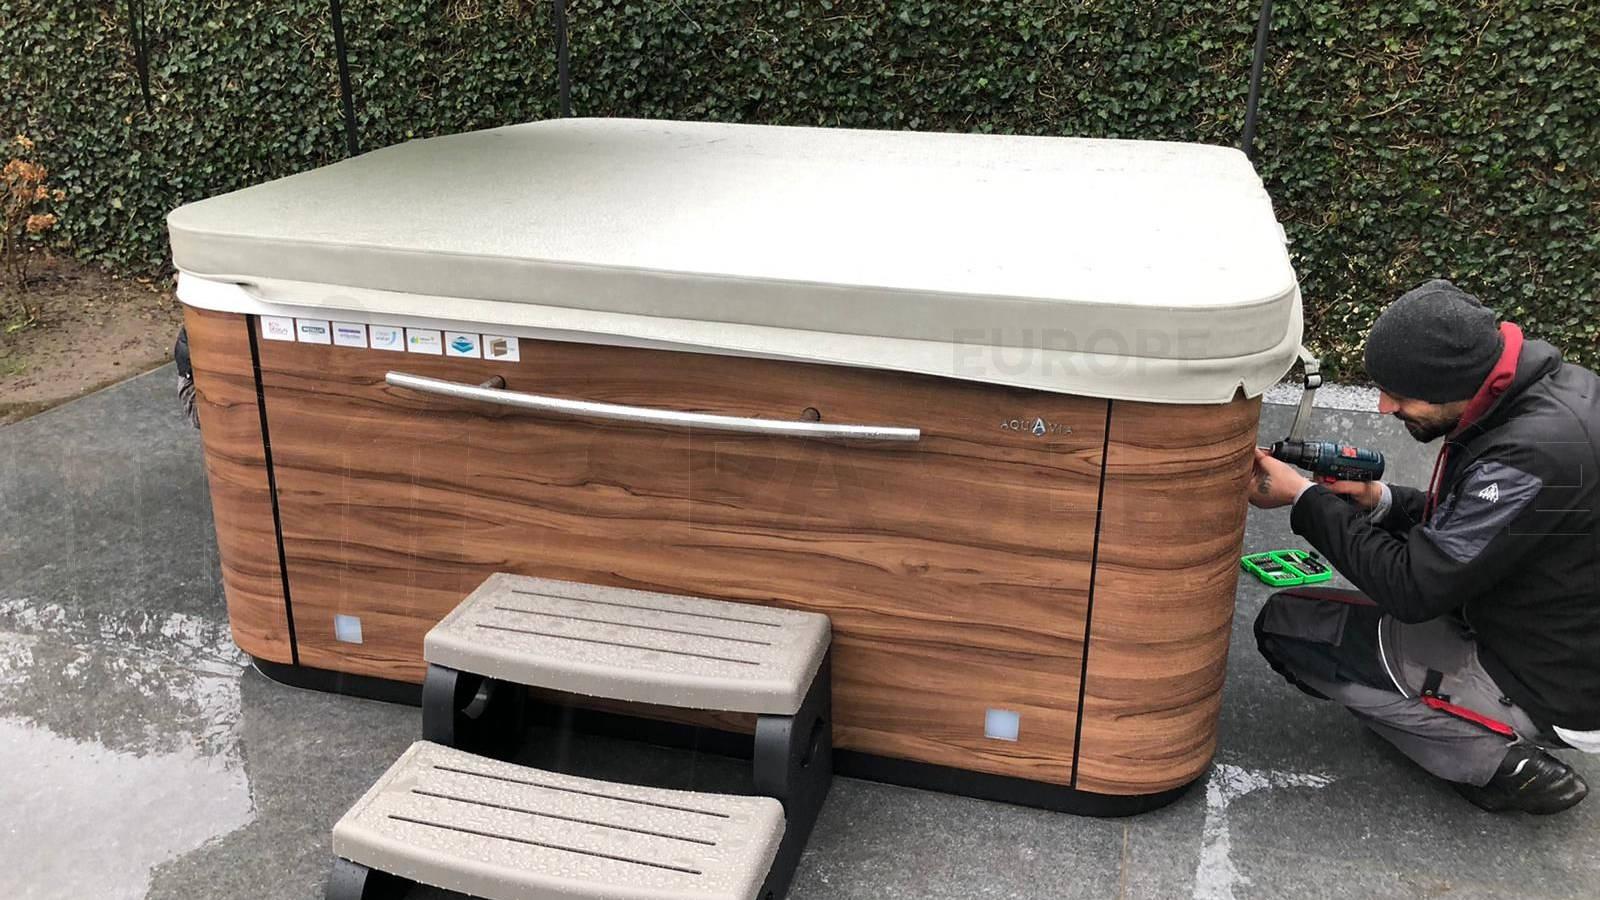 Plaatsing van een Aquavia spa in Sint-Gillis-Waas België